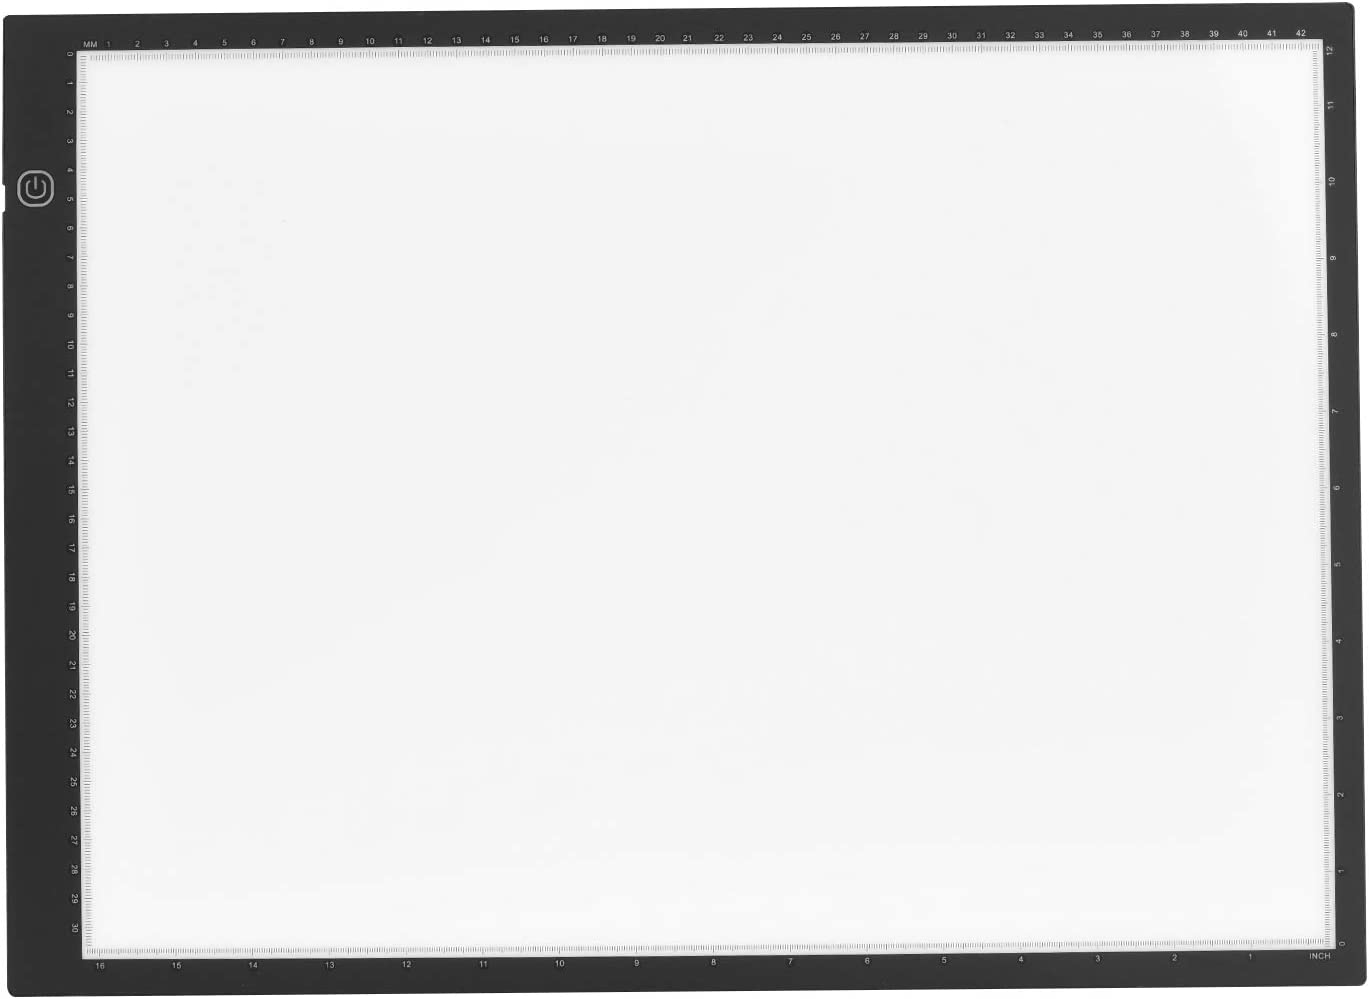 Ajcoflt A3 Caja de luz LED Pad Tracer Tableta gr/áfica Trazado Tablero de dibujo Tablero Atenuaci/ón continua con cable USB para artista Animaci/ón Dise/ño Boceto Caligraf/ía